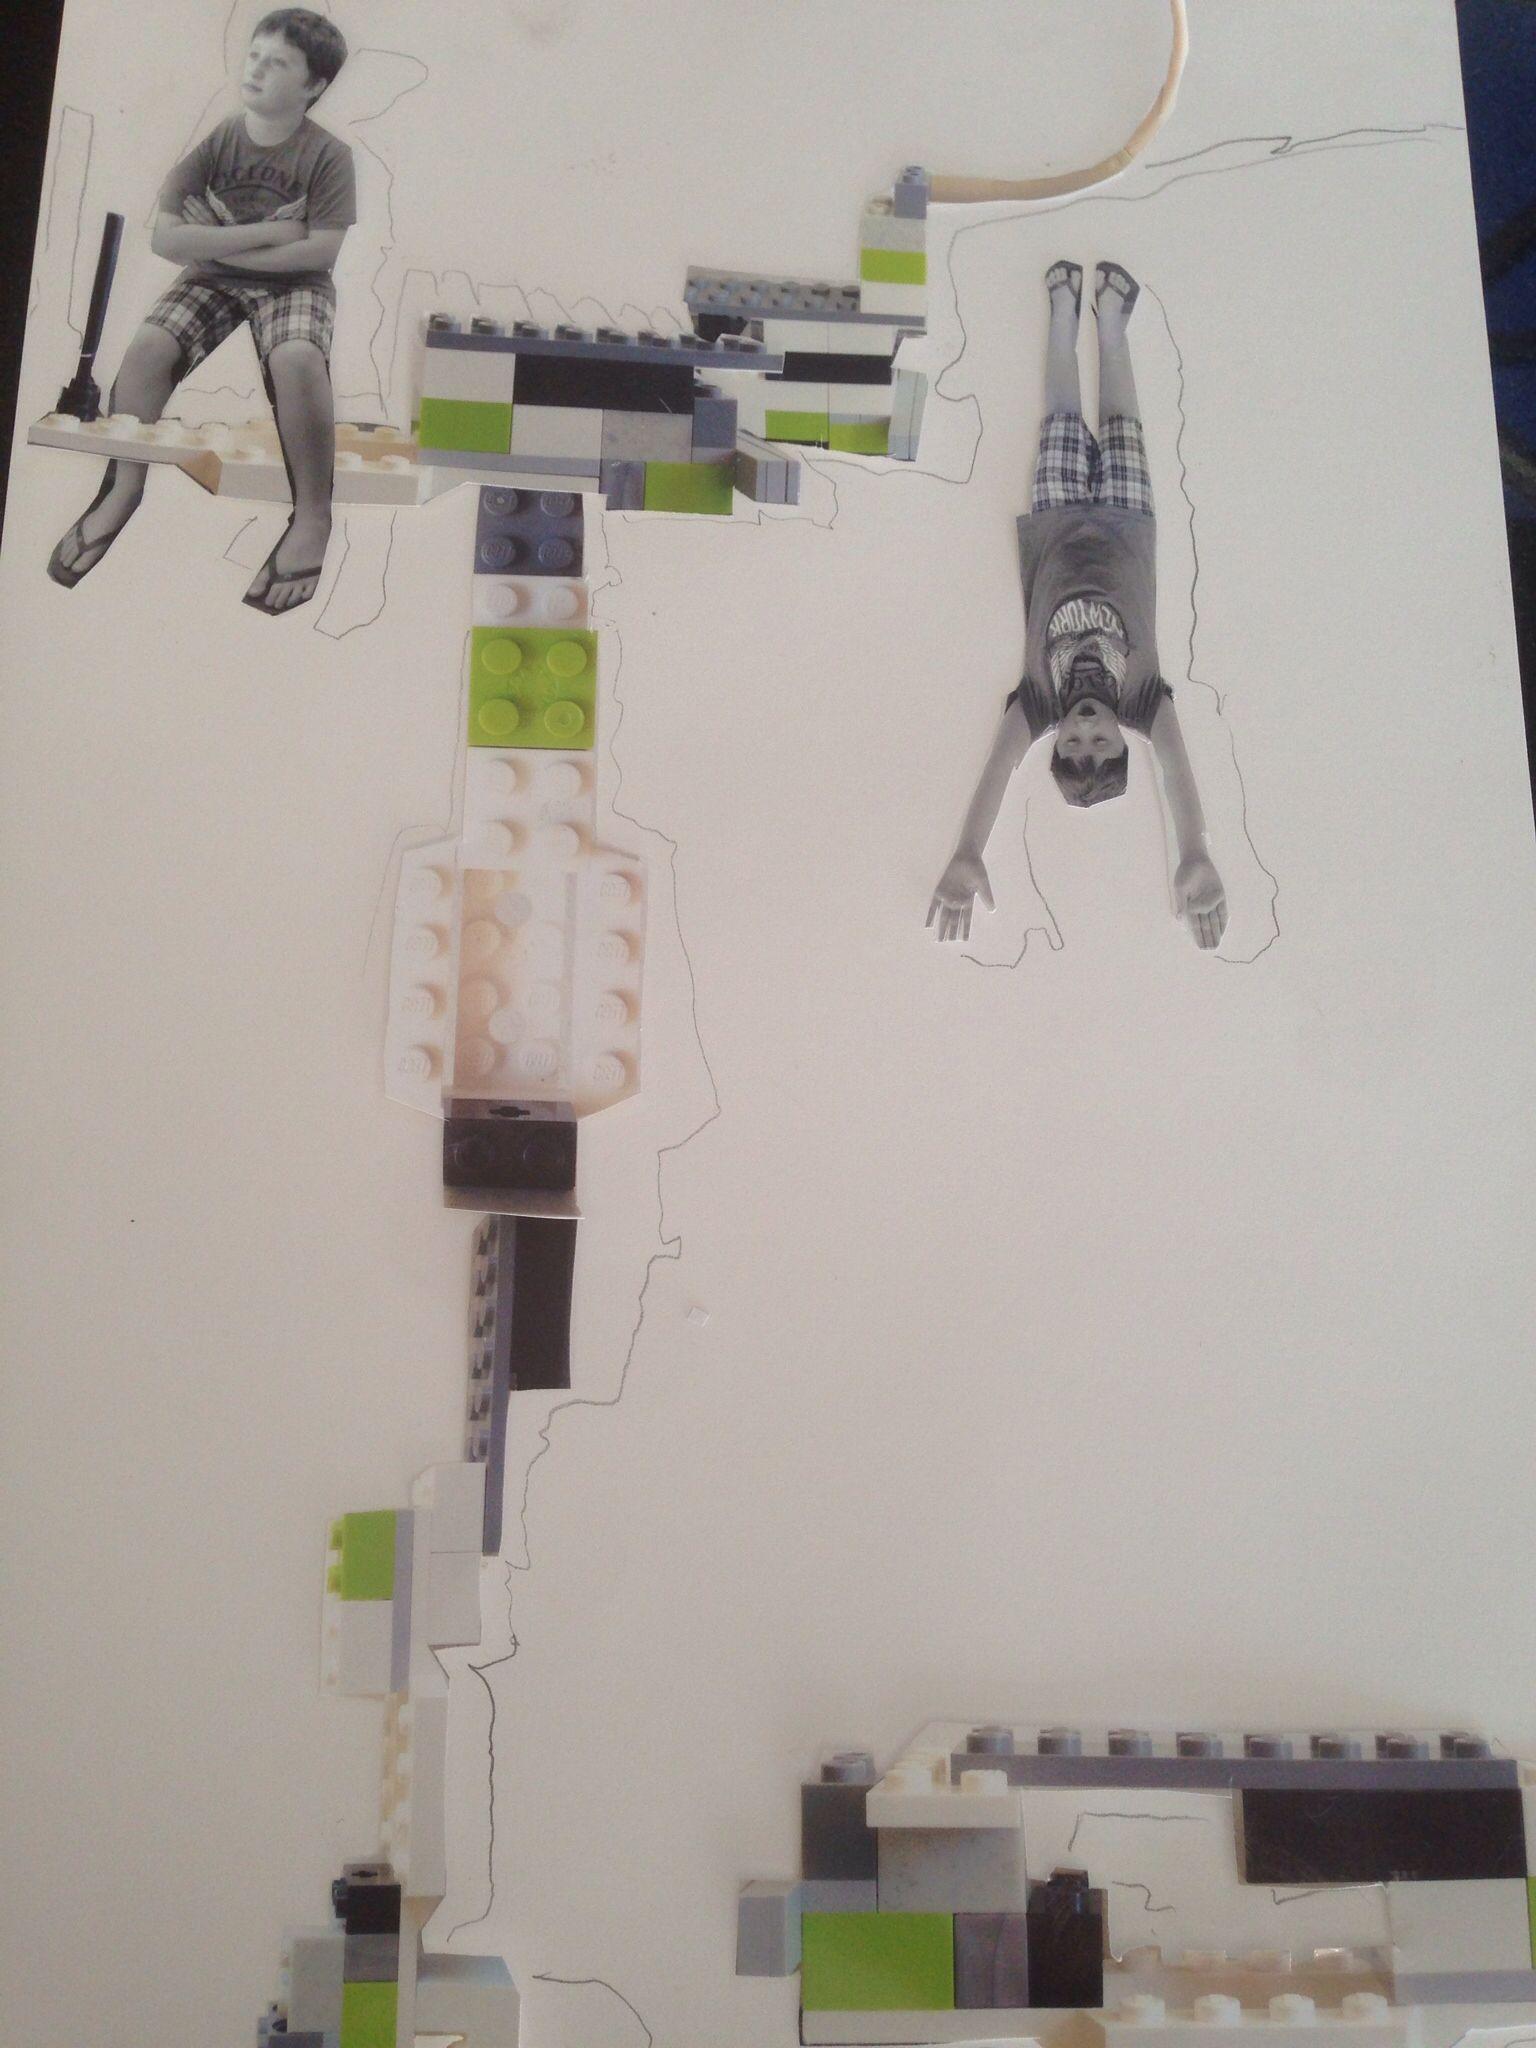 Lego collage in progress. smallSHOP